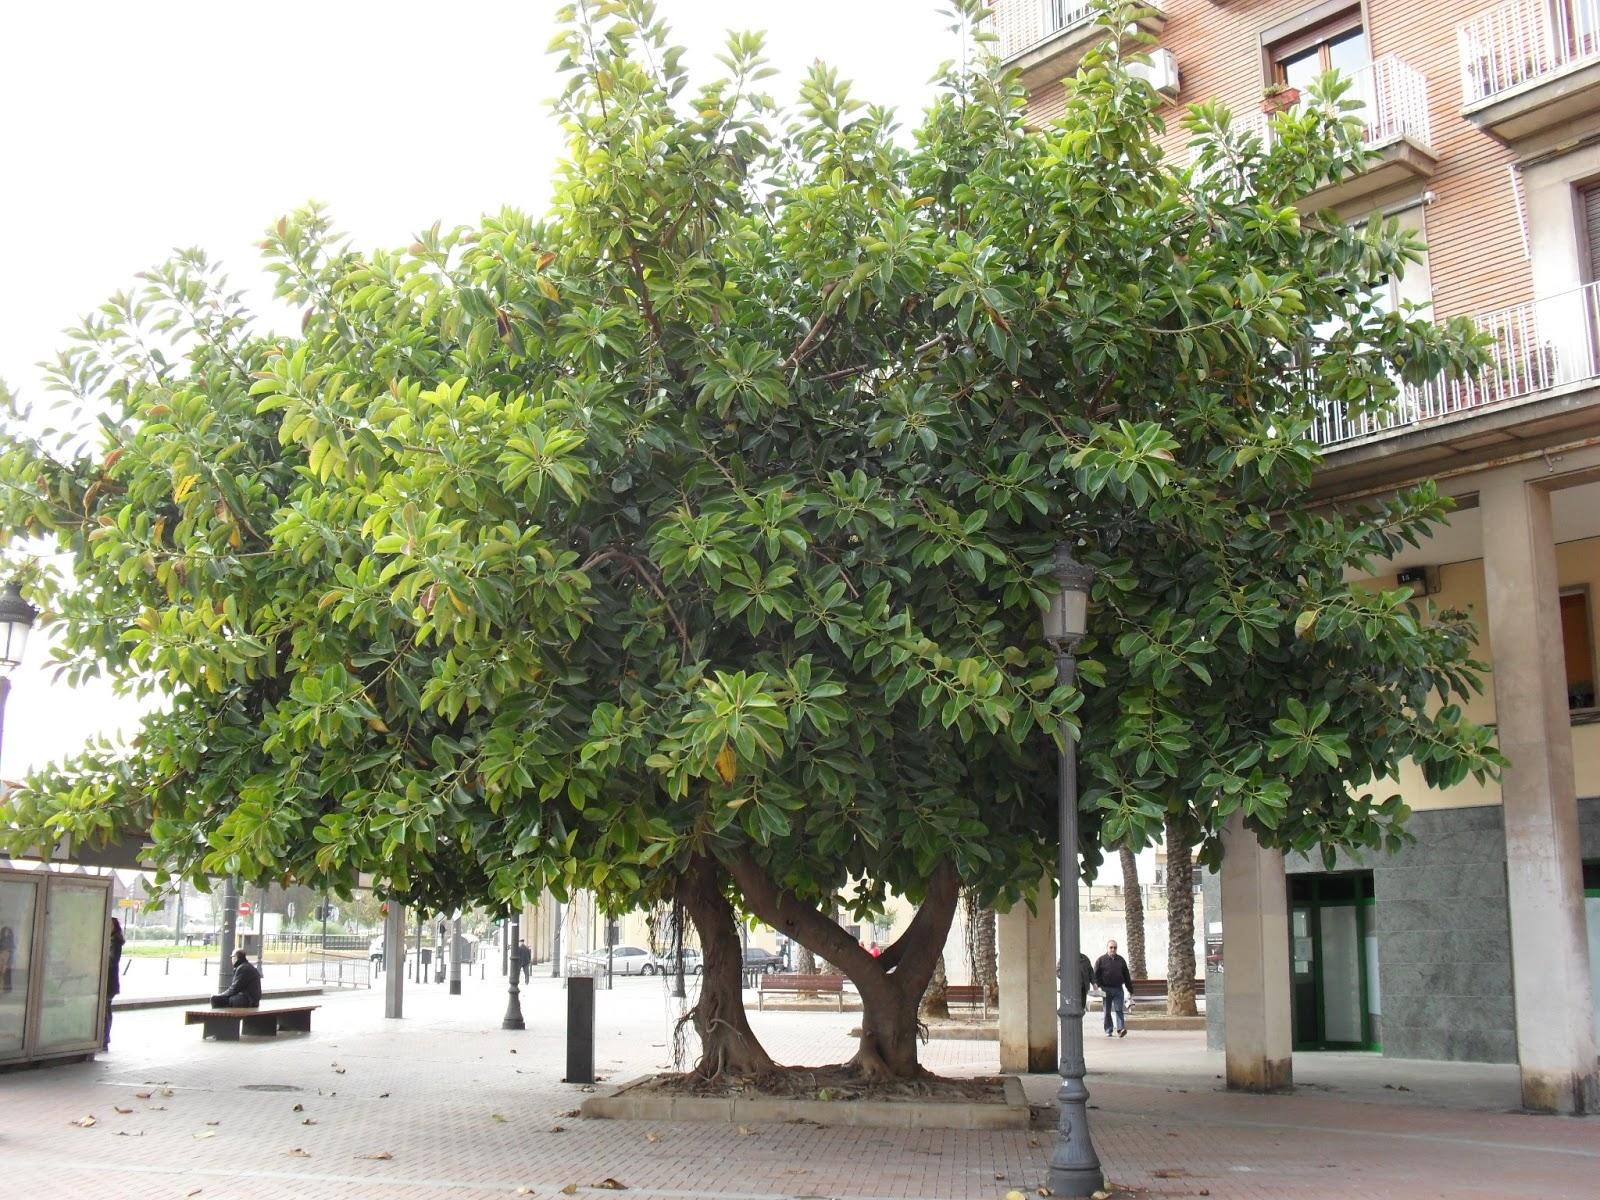 Tercera eposha arbol ficus de la plaza armada espa ola de for Arbol comun